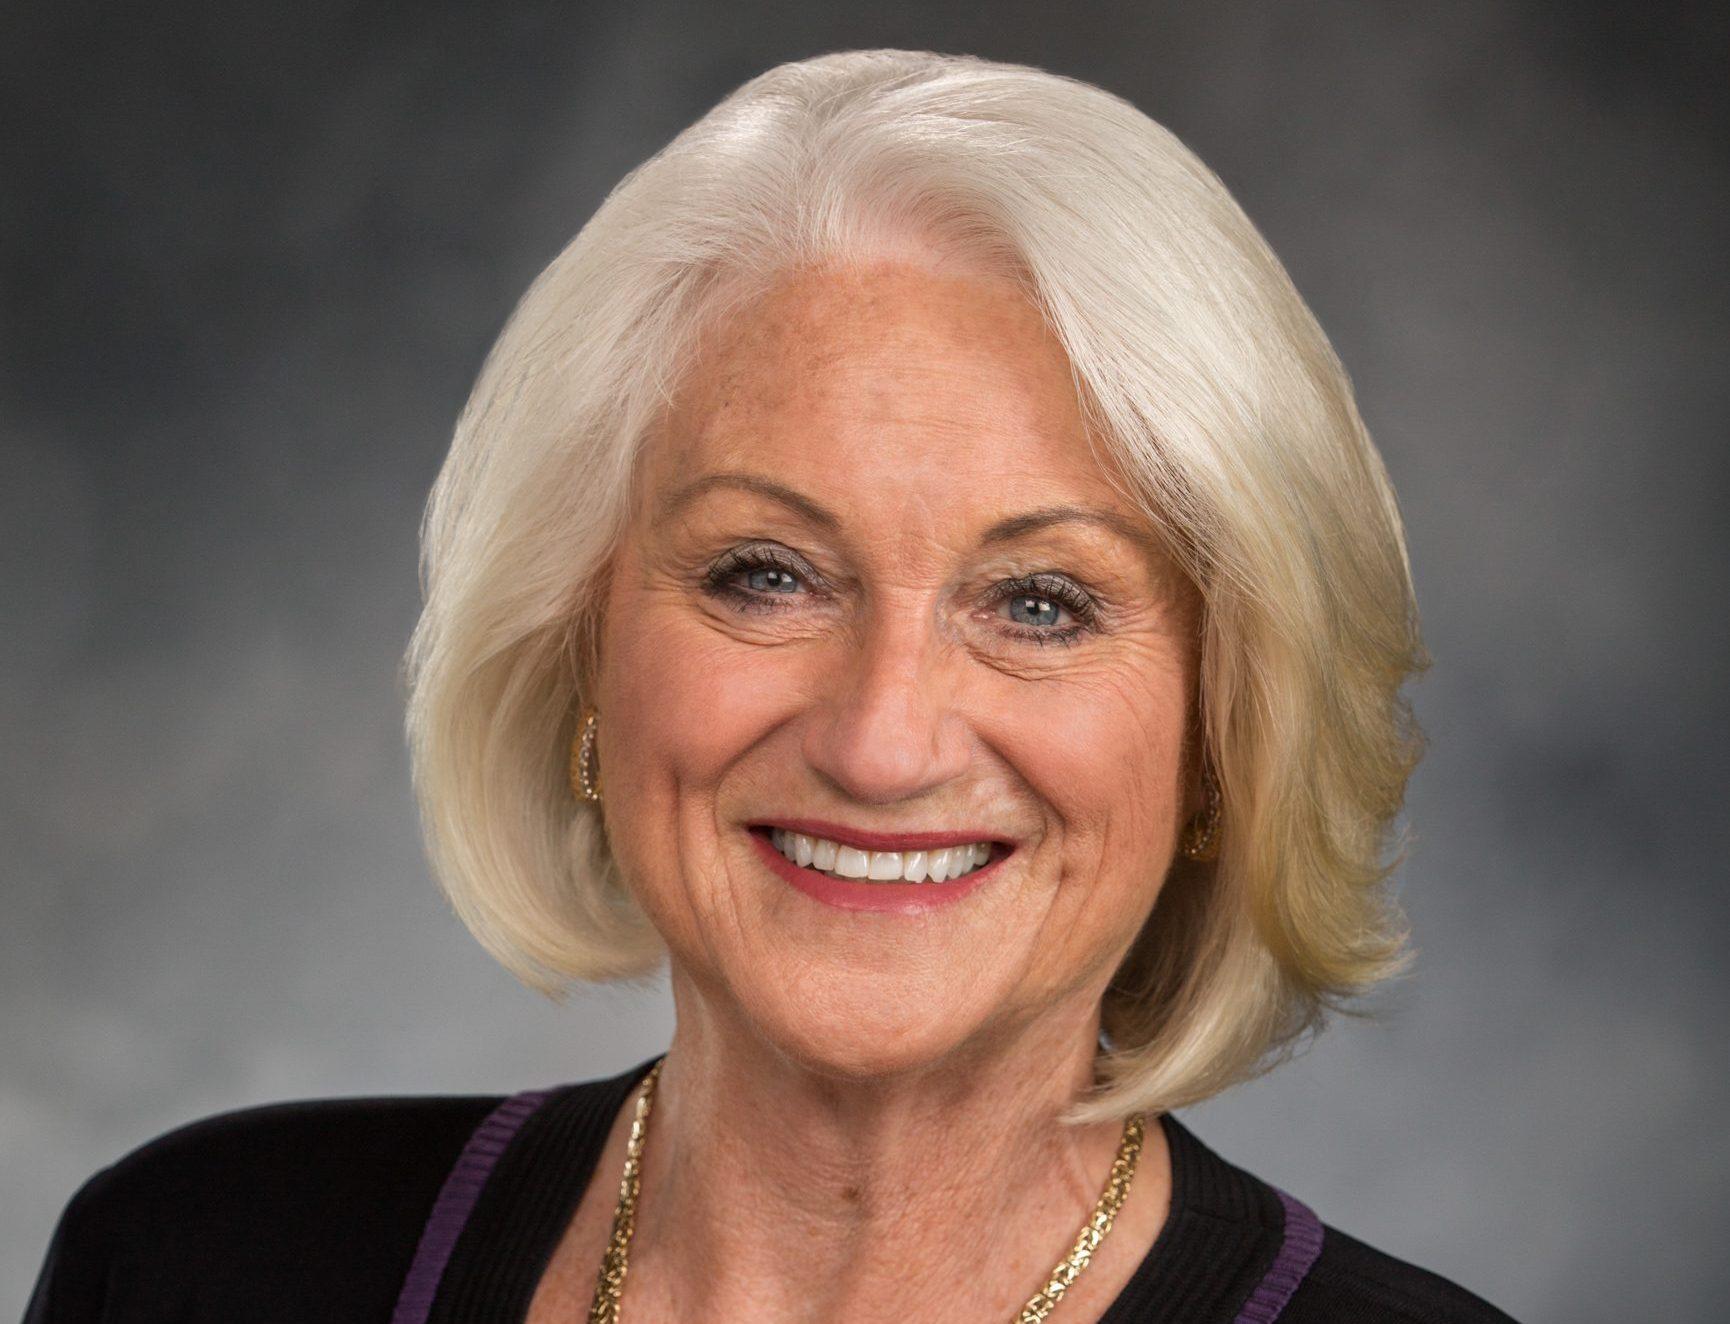 State Senator Randi Becker